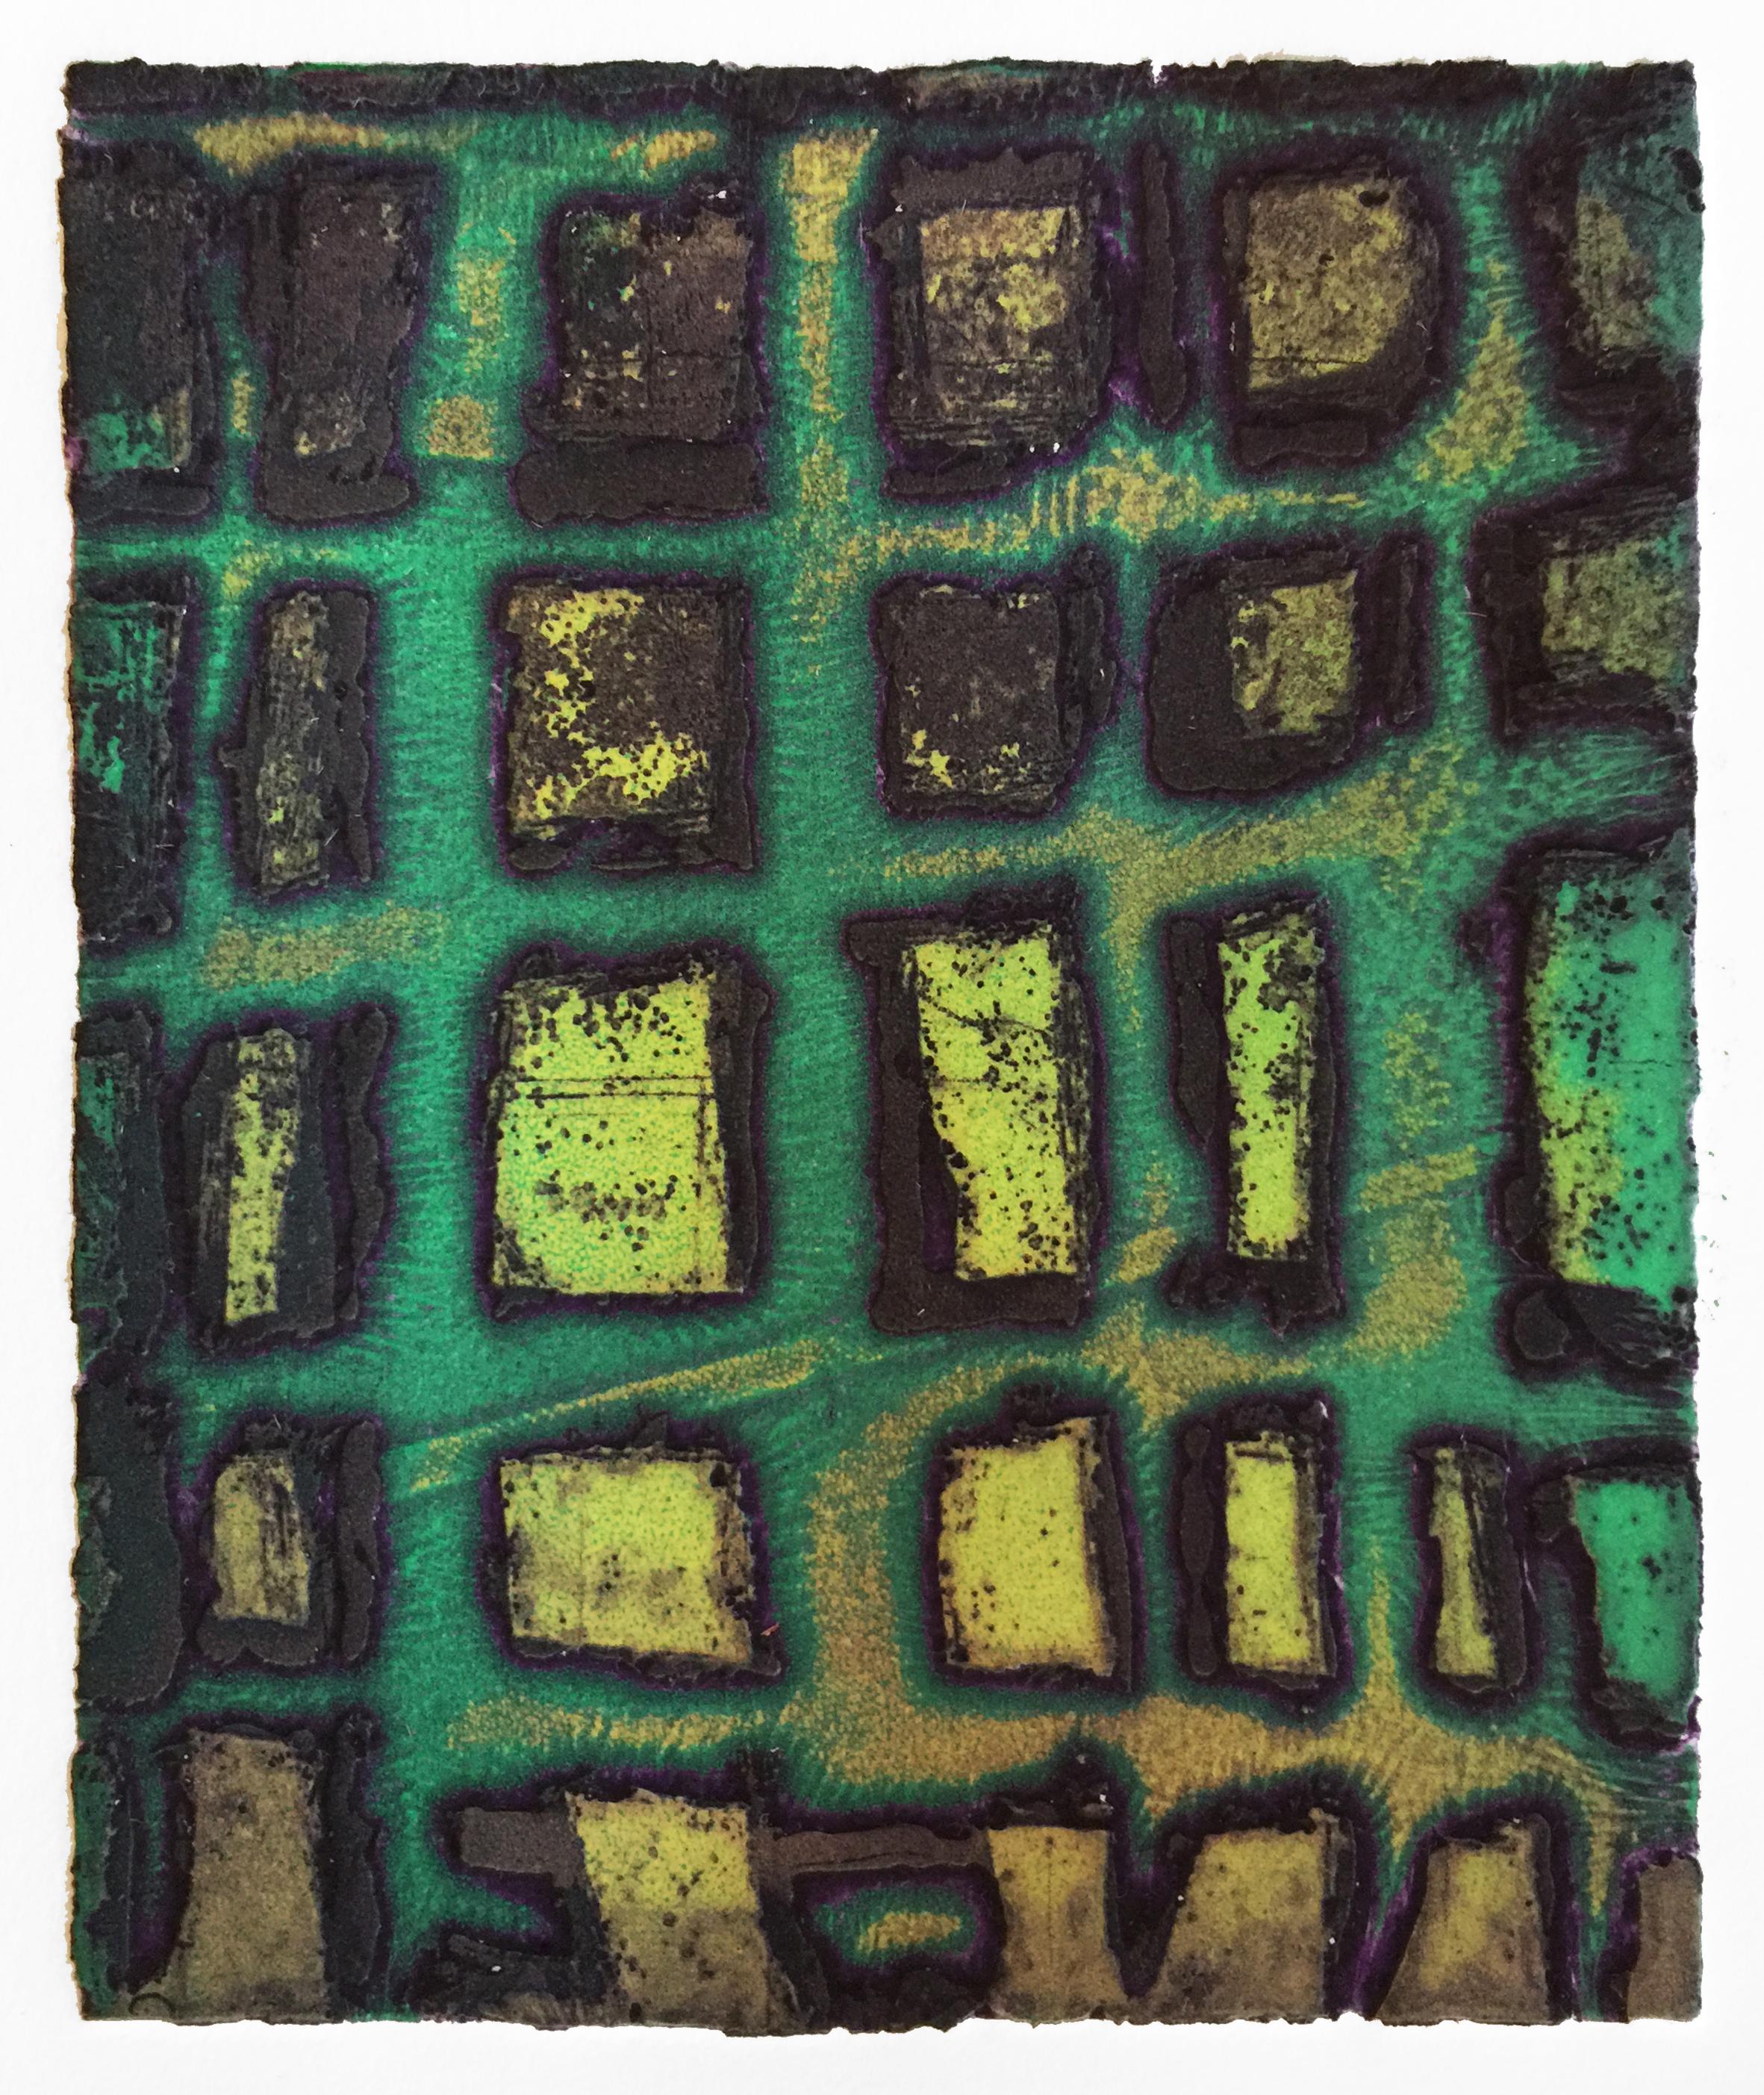 Green Weave (Night Spirits), 2018